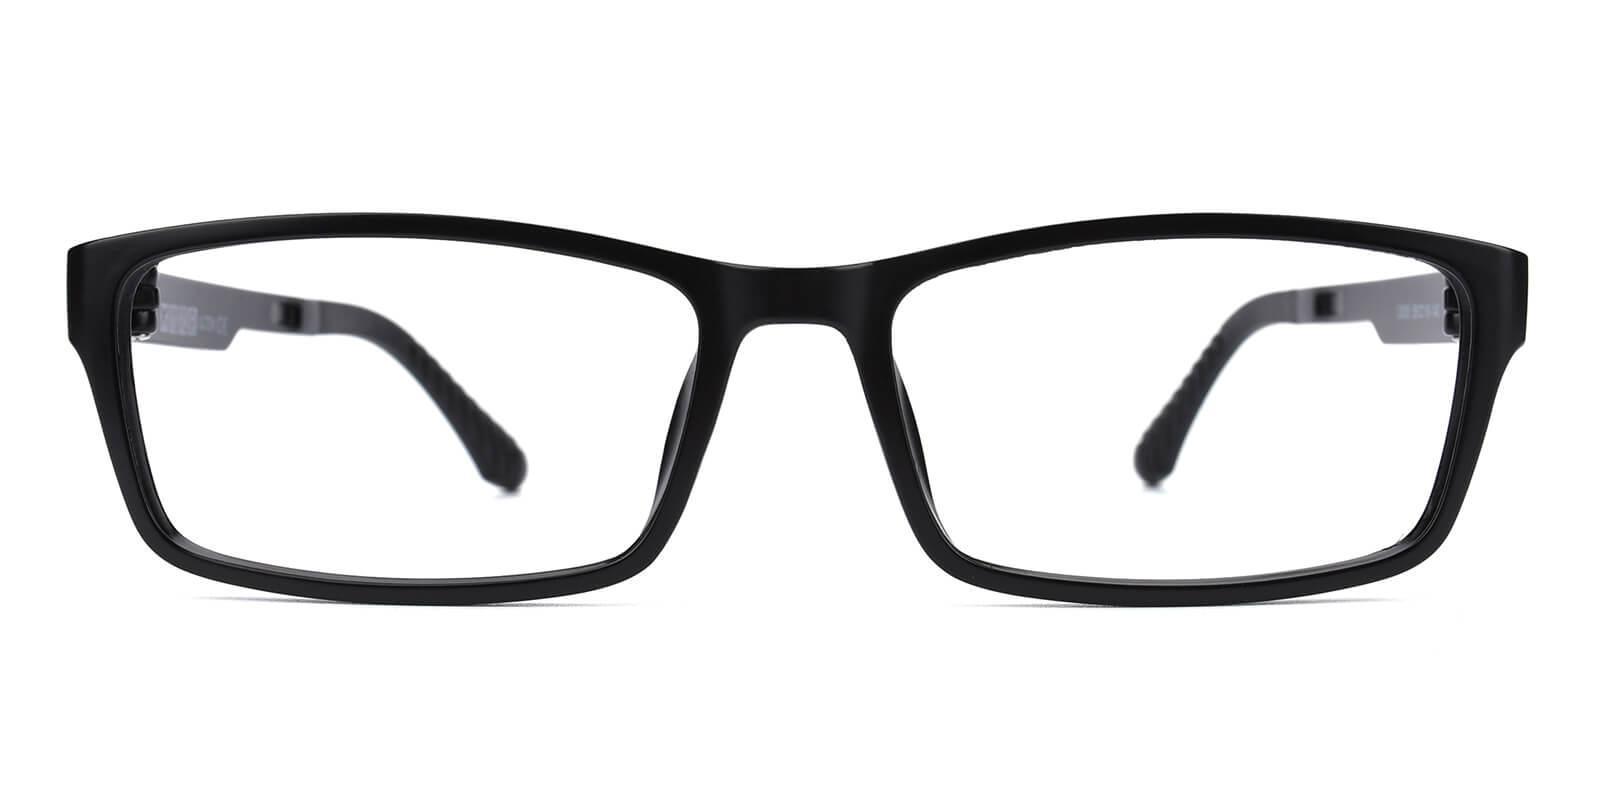 Evidina-Black-Rectangle-Plastic-Eyeglasses-additional2